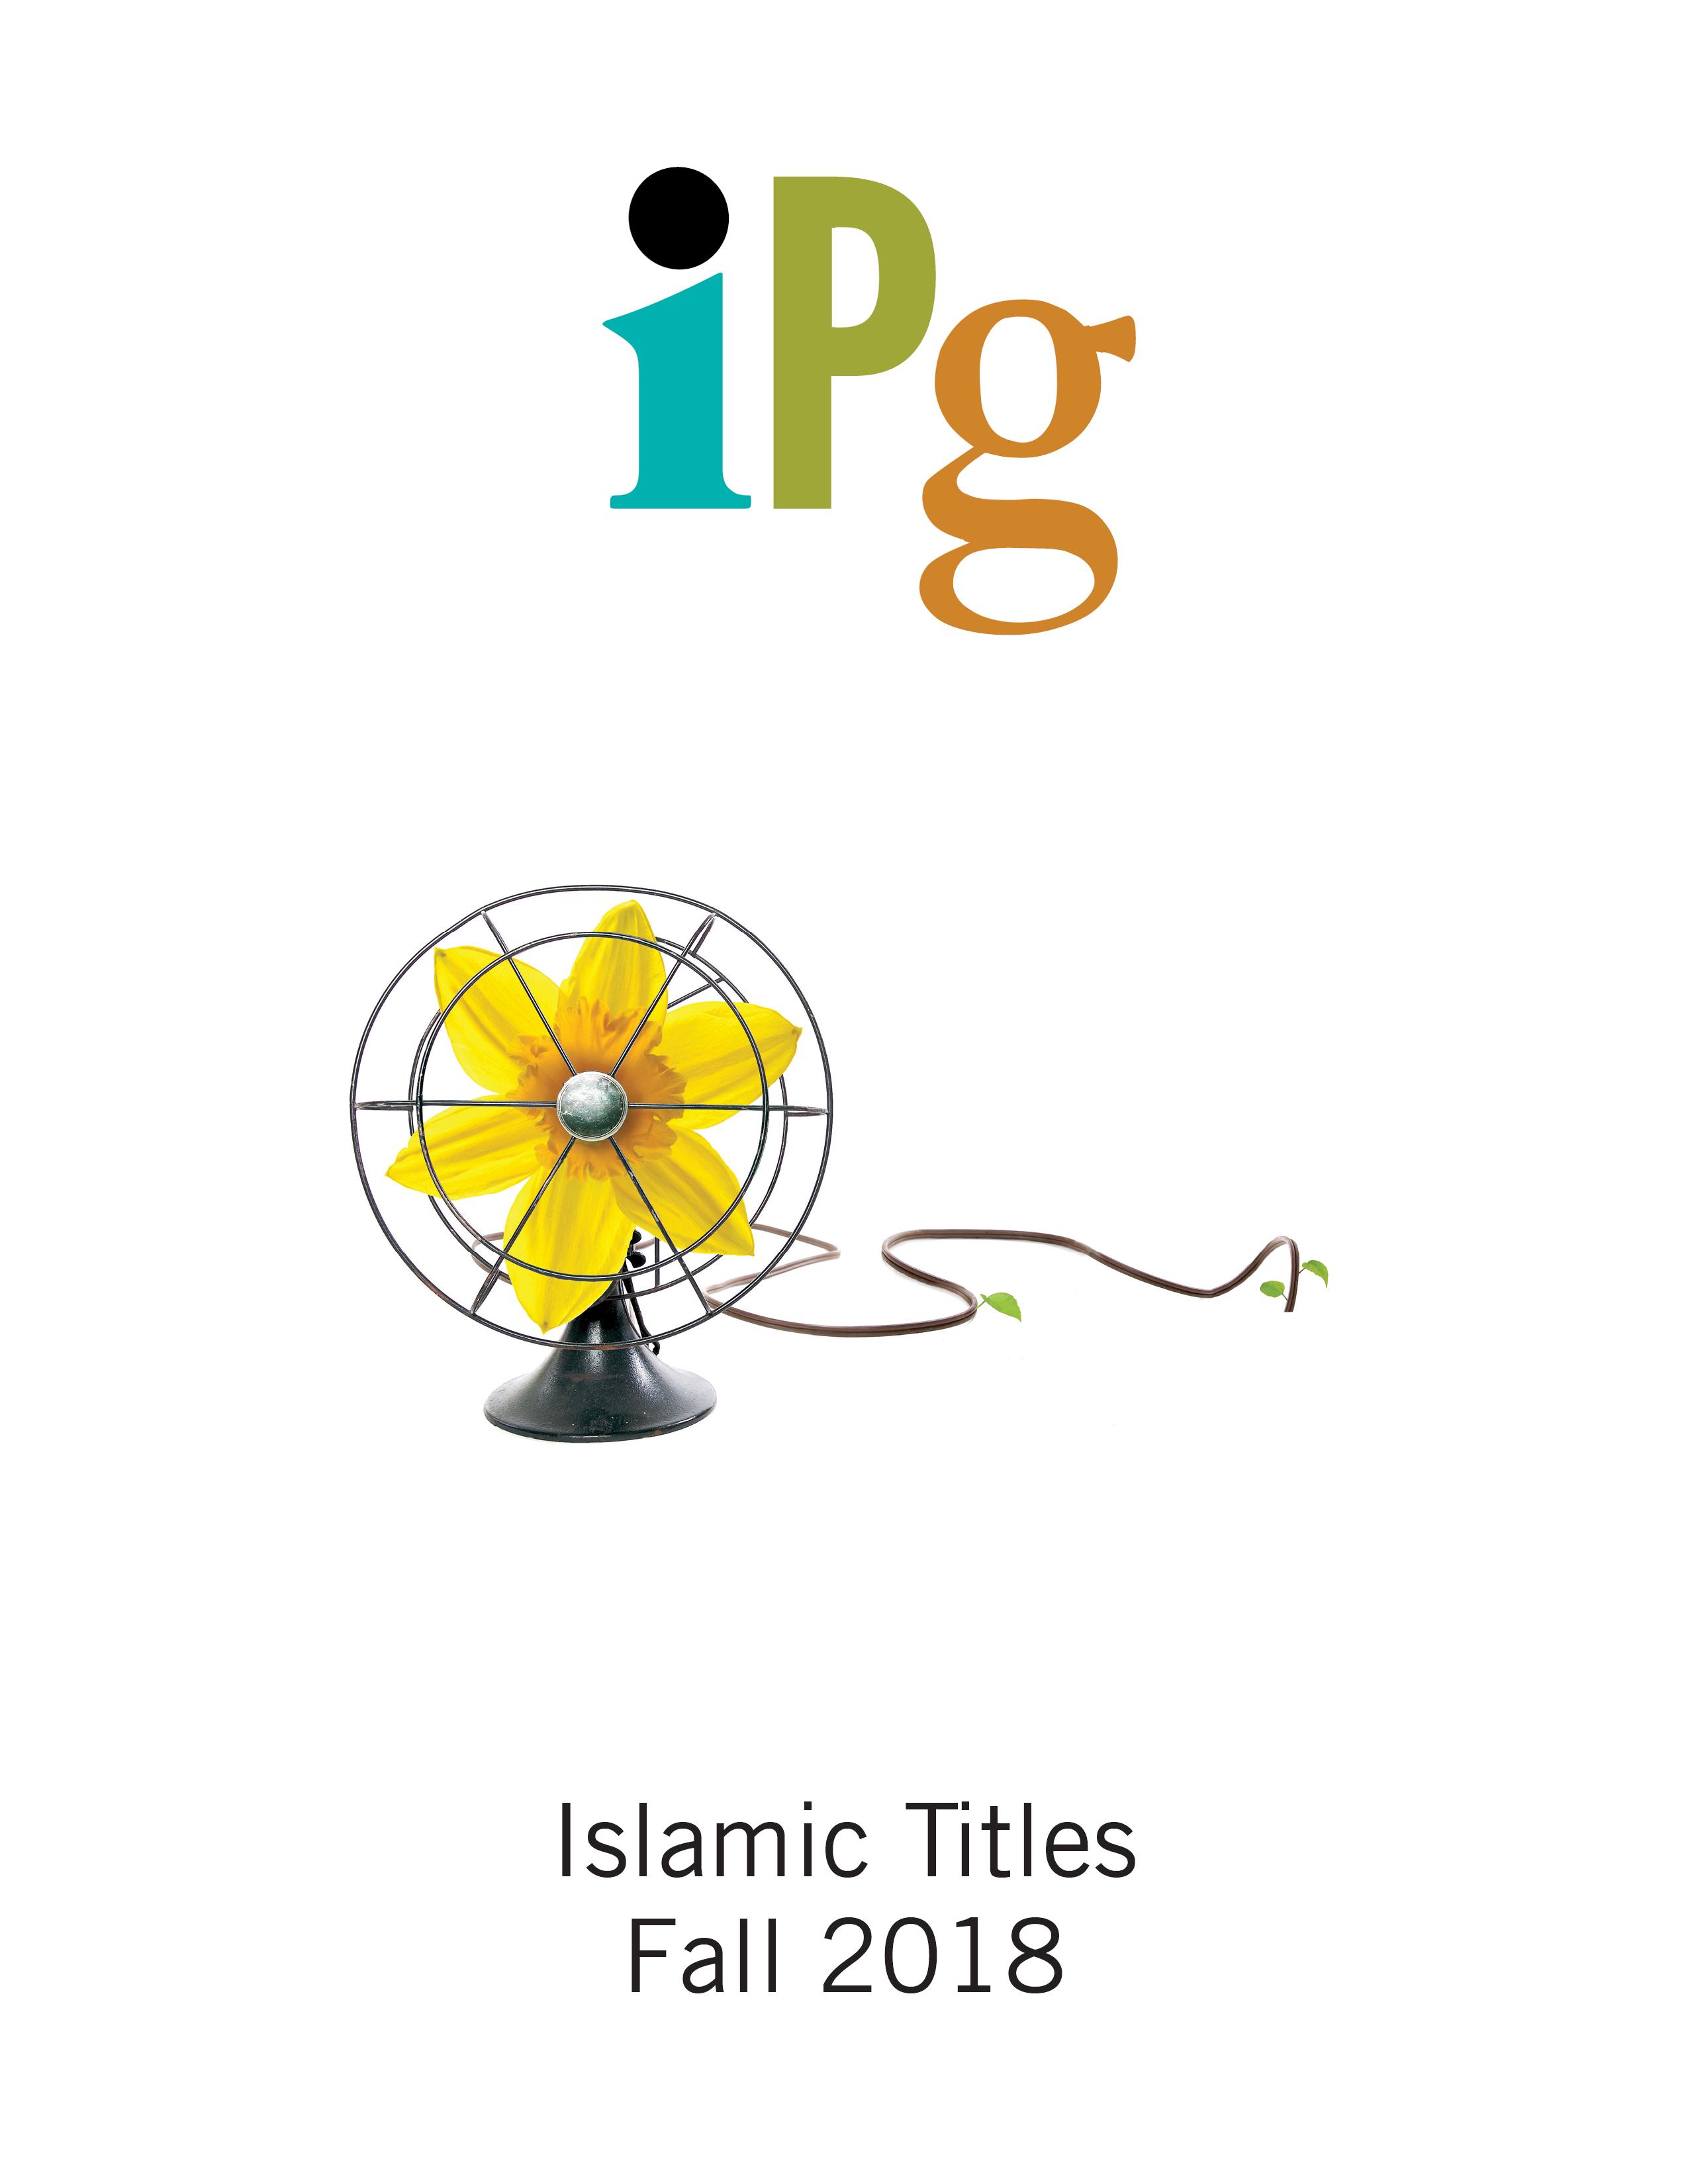 Islamic Interest Titles